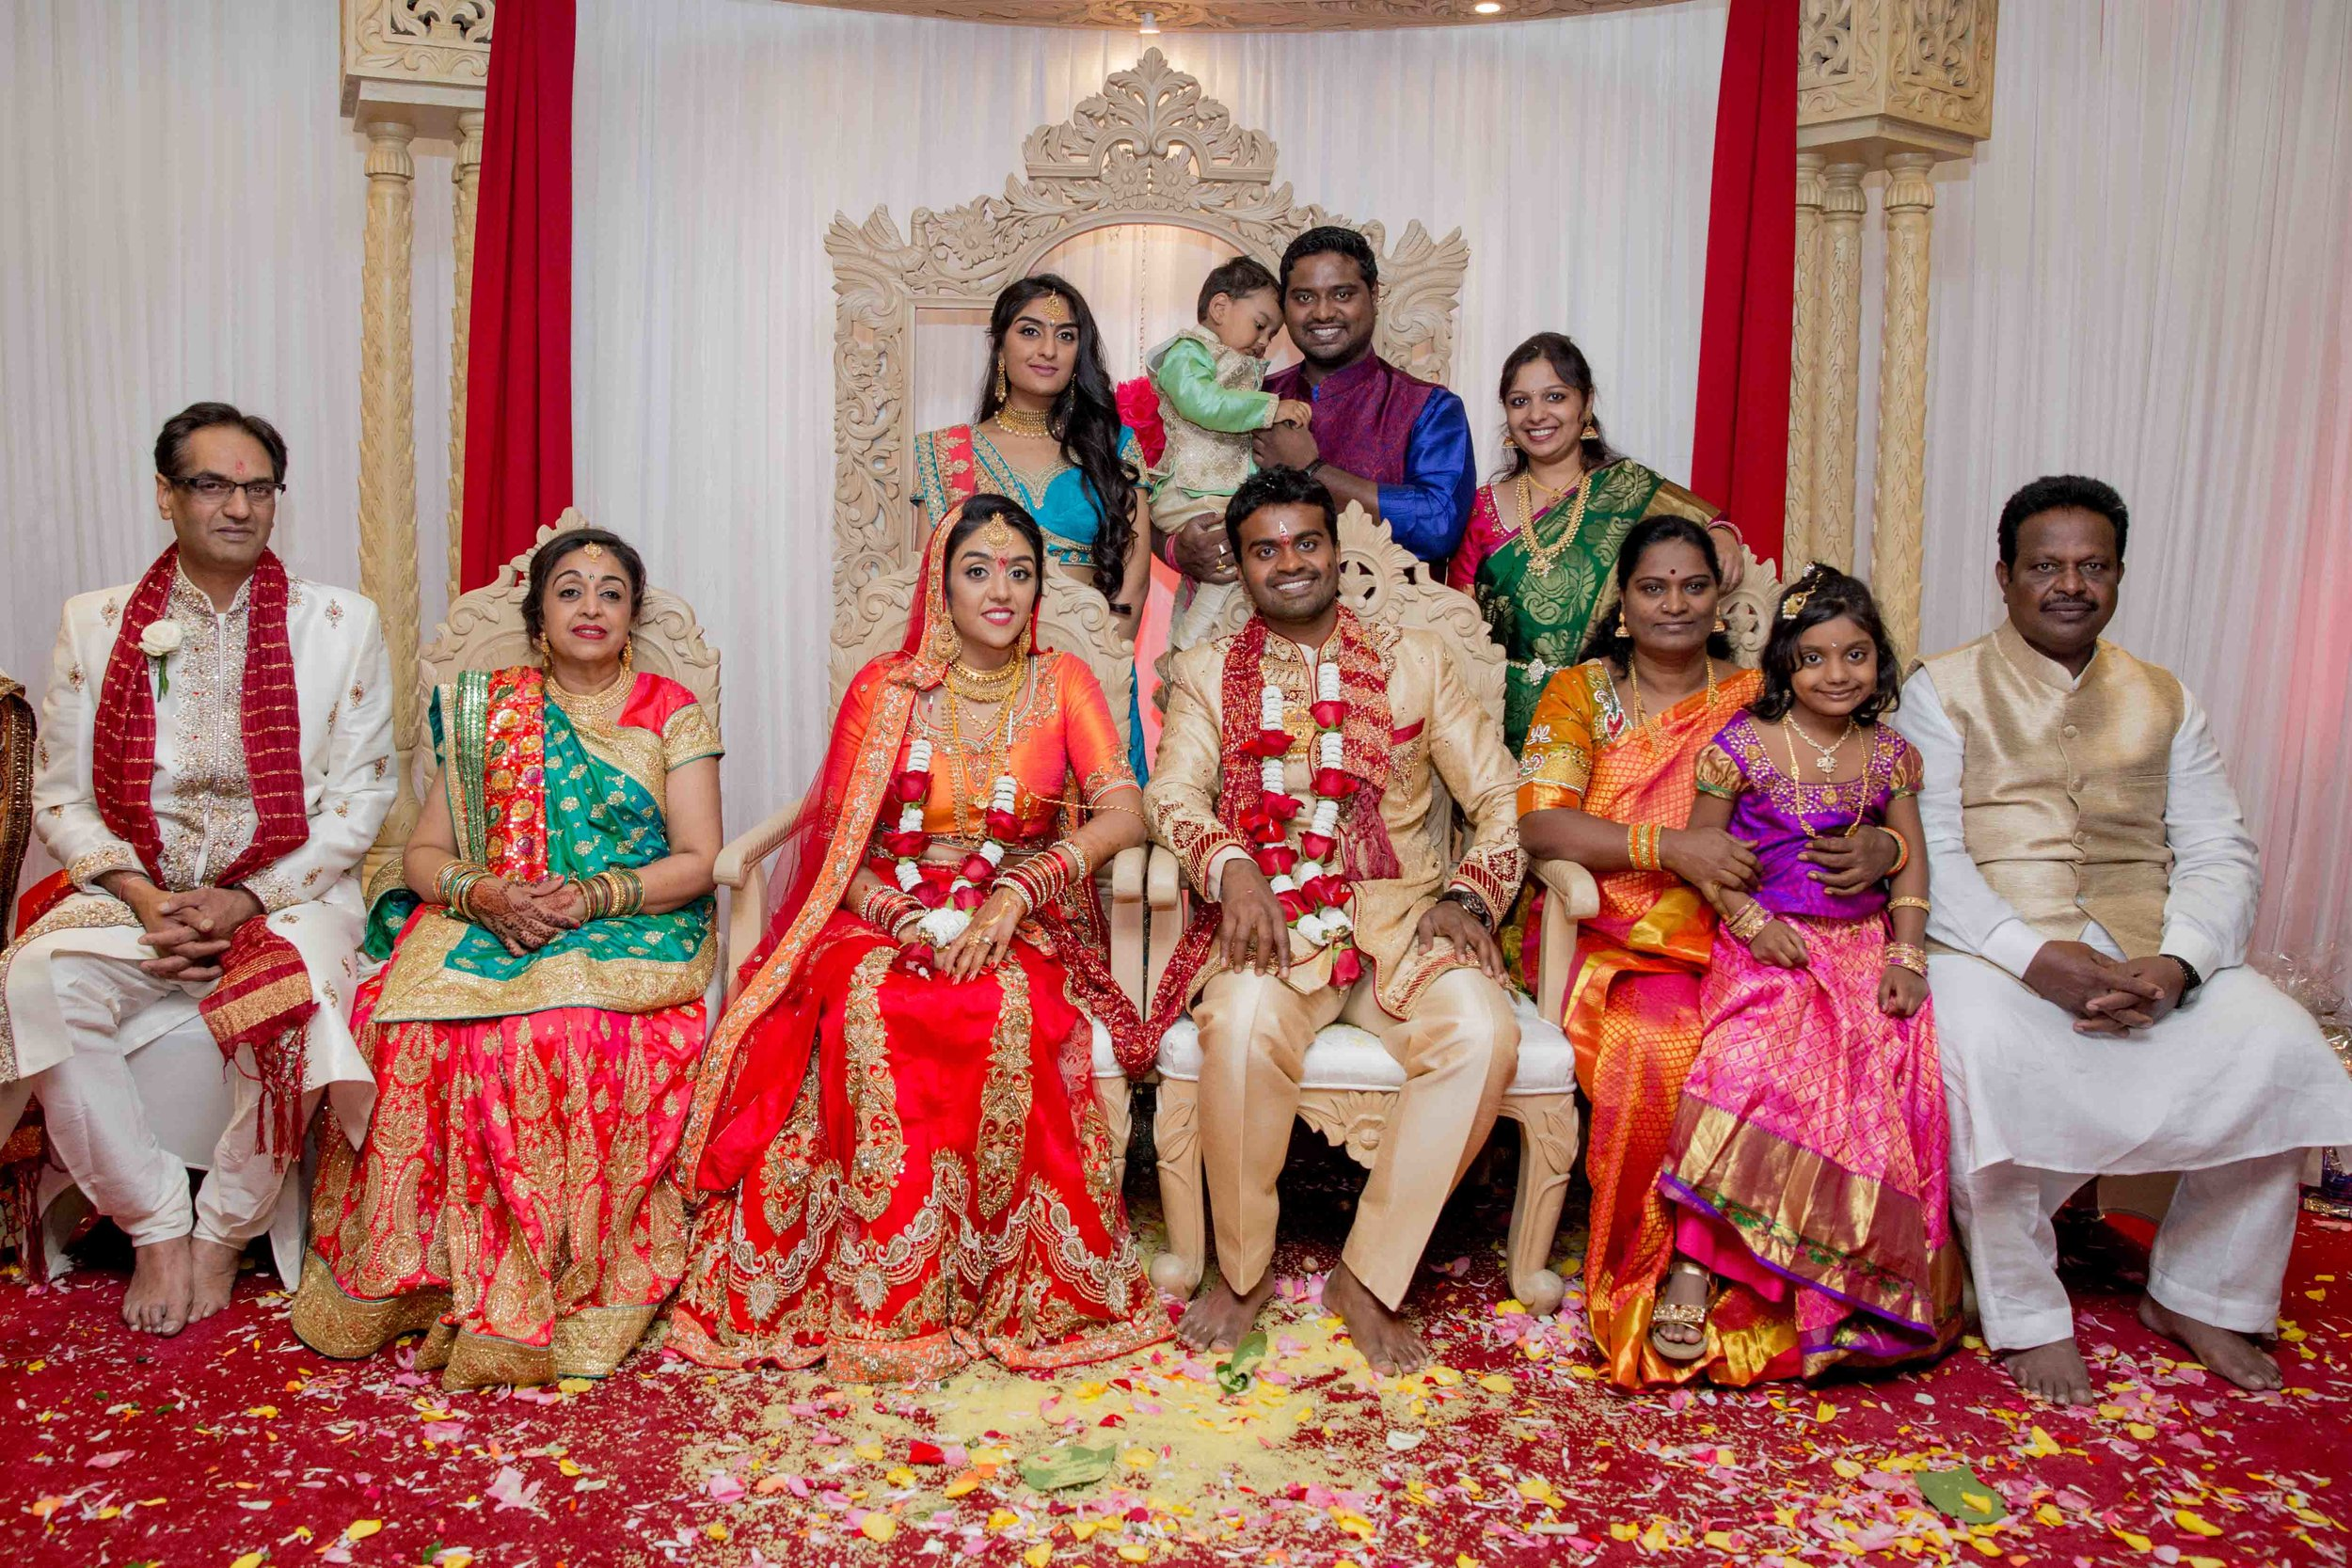 premier-banquetting-london-Hindu-asian-wedding-photographer-natalia-smith-photography-40.jpg